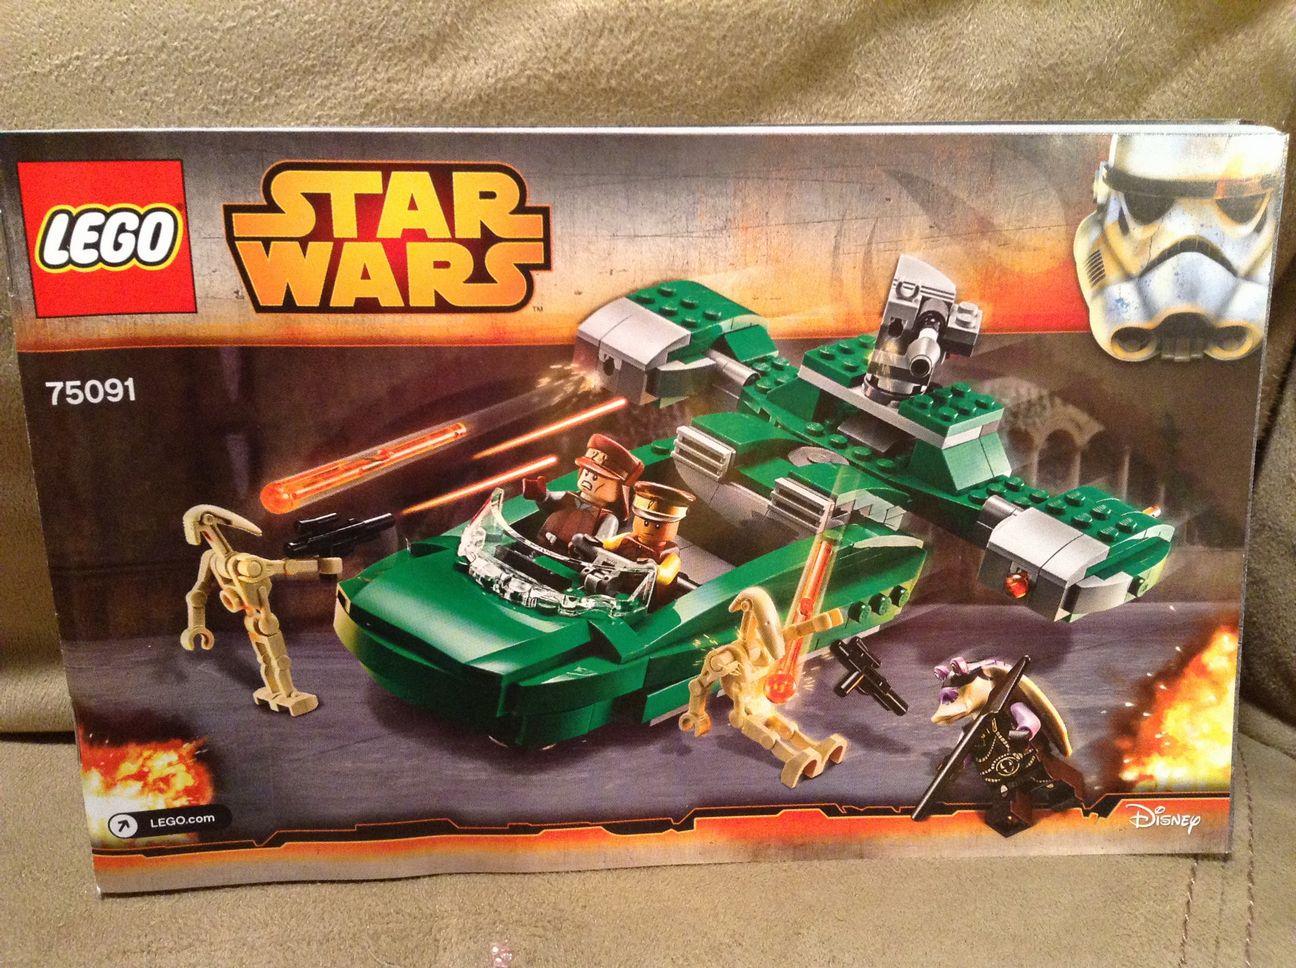 Lego 75091 Star Wars Flash Speeder Replacement Instruction Manual